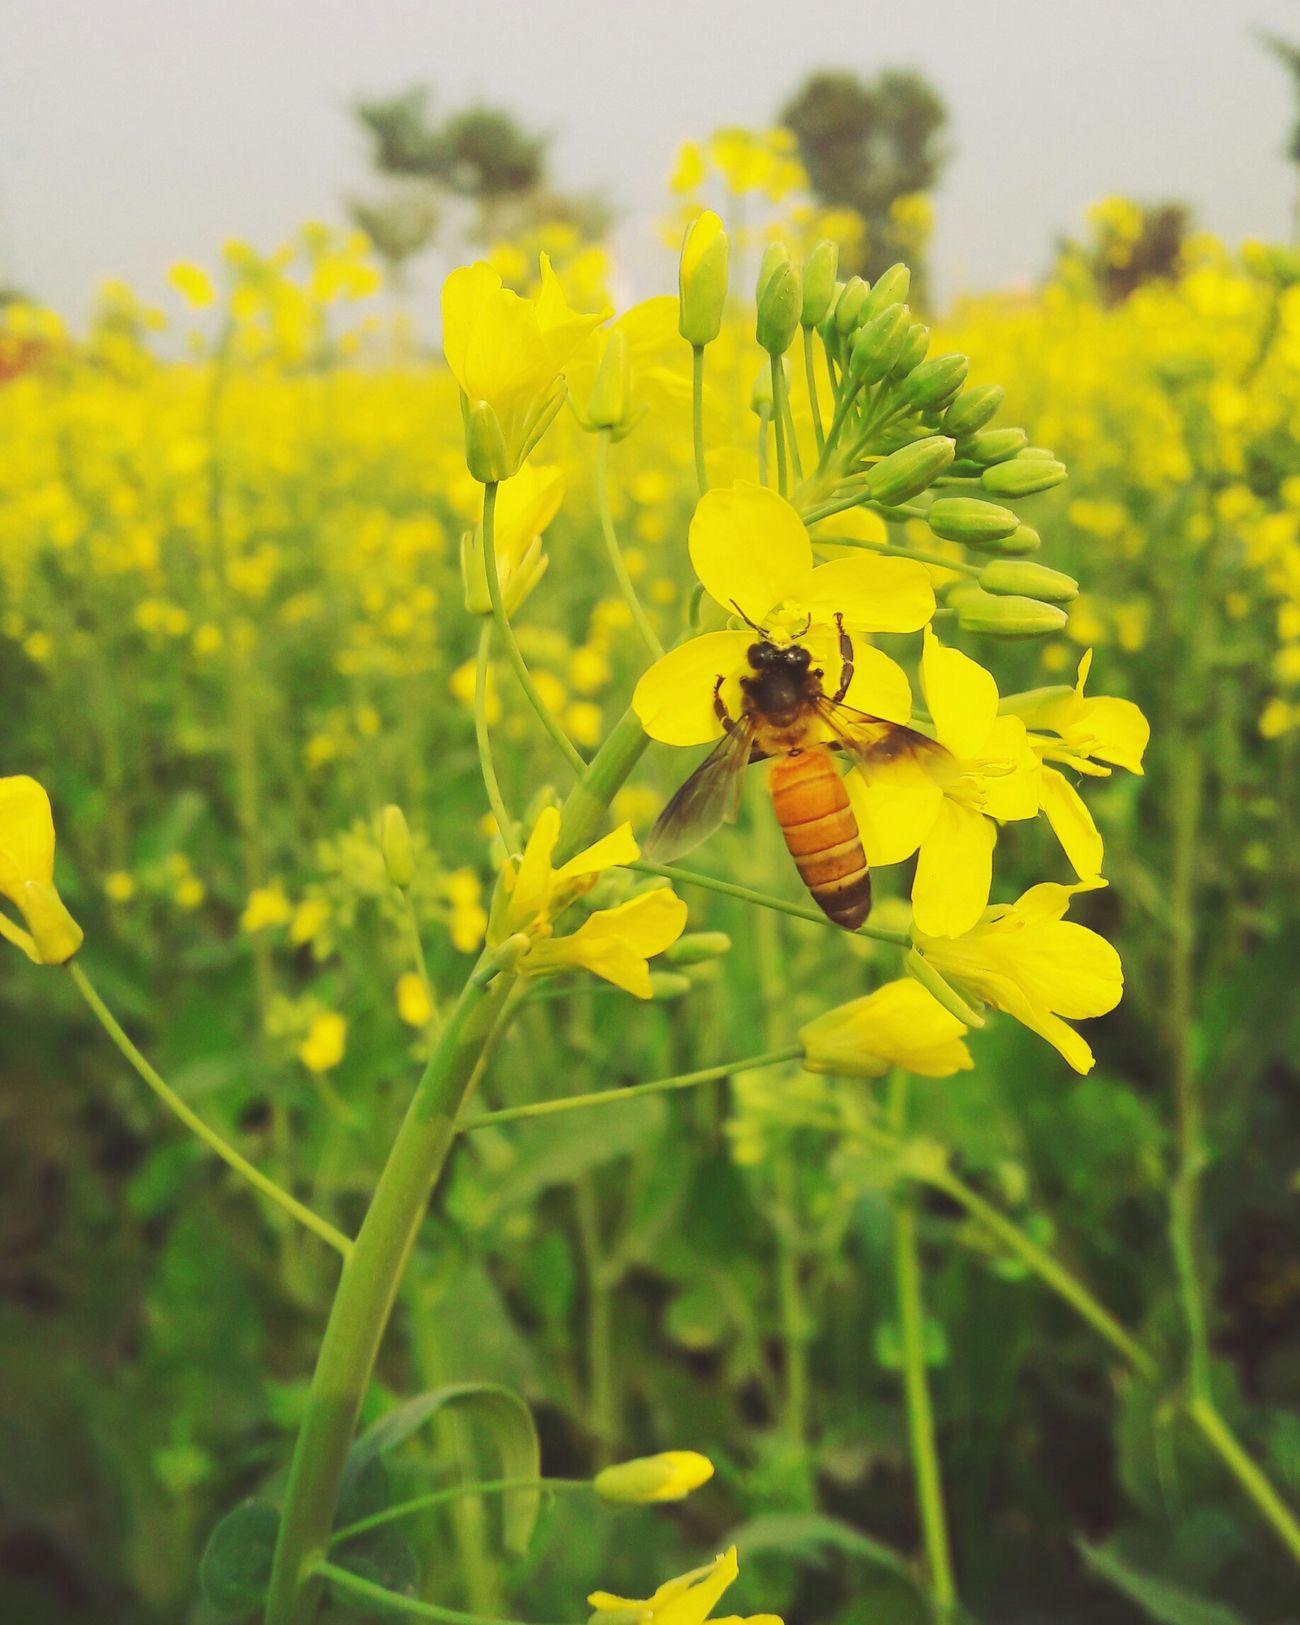 Bee 🐝 Mobilephotography Flowers Yellow Flowers Flowerporn Beautiful Withouteffect Beauty Of Nature Pakistanphotochallenge In Pakistan Eyeem Pakistan Open Edit Littleflower Nawanlahore